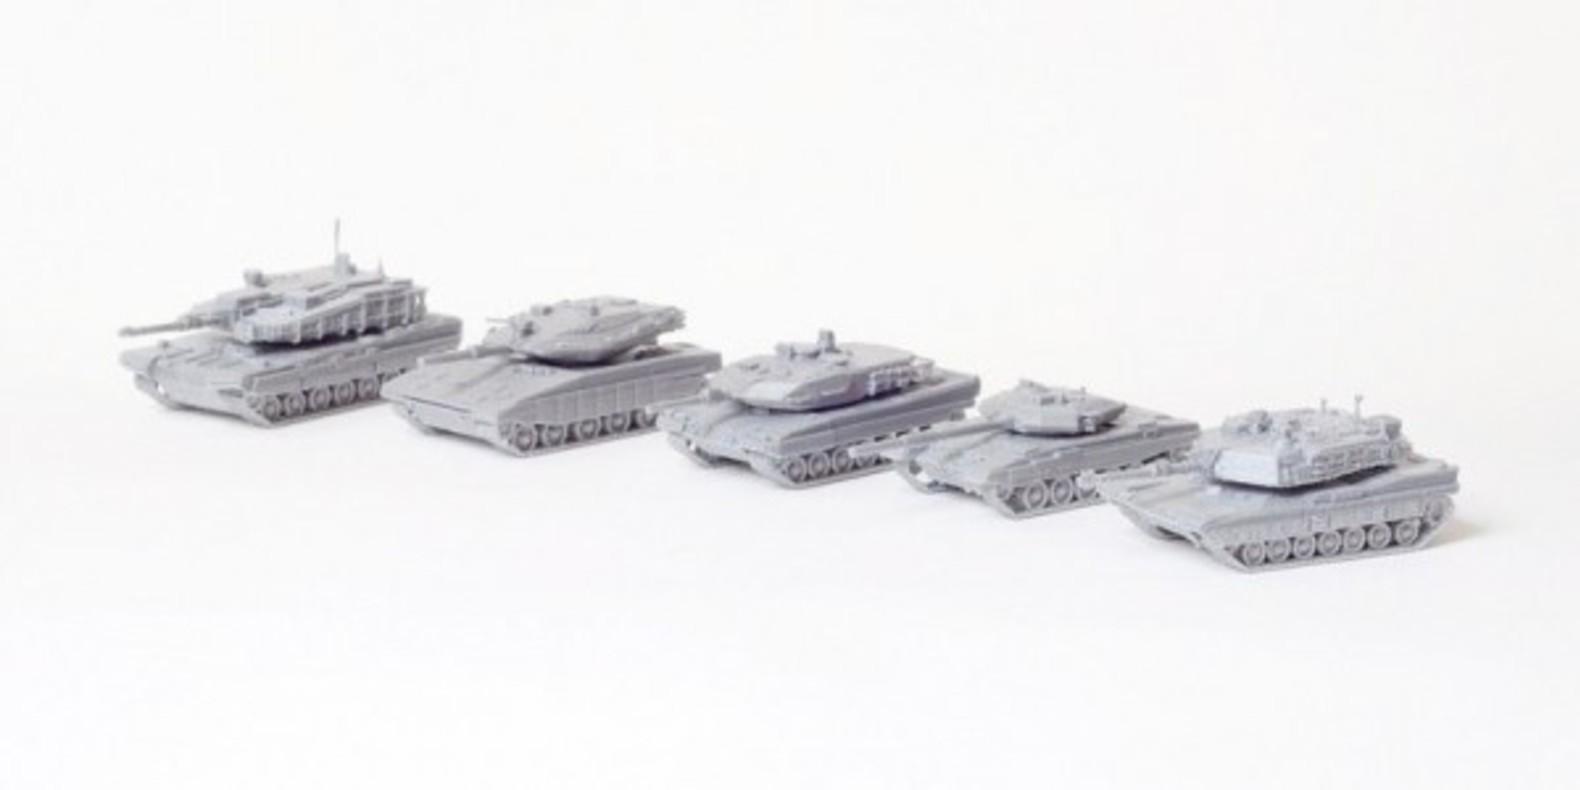 tanks-duc-tran-formbyte-fichier-3d-stl-gratuit-cults-1